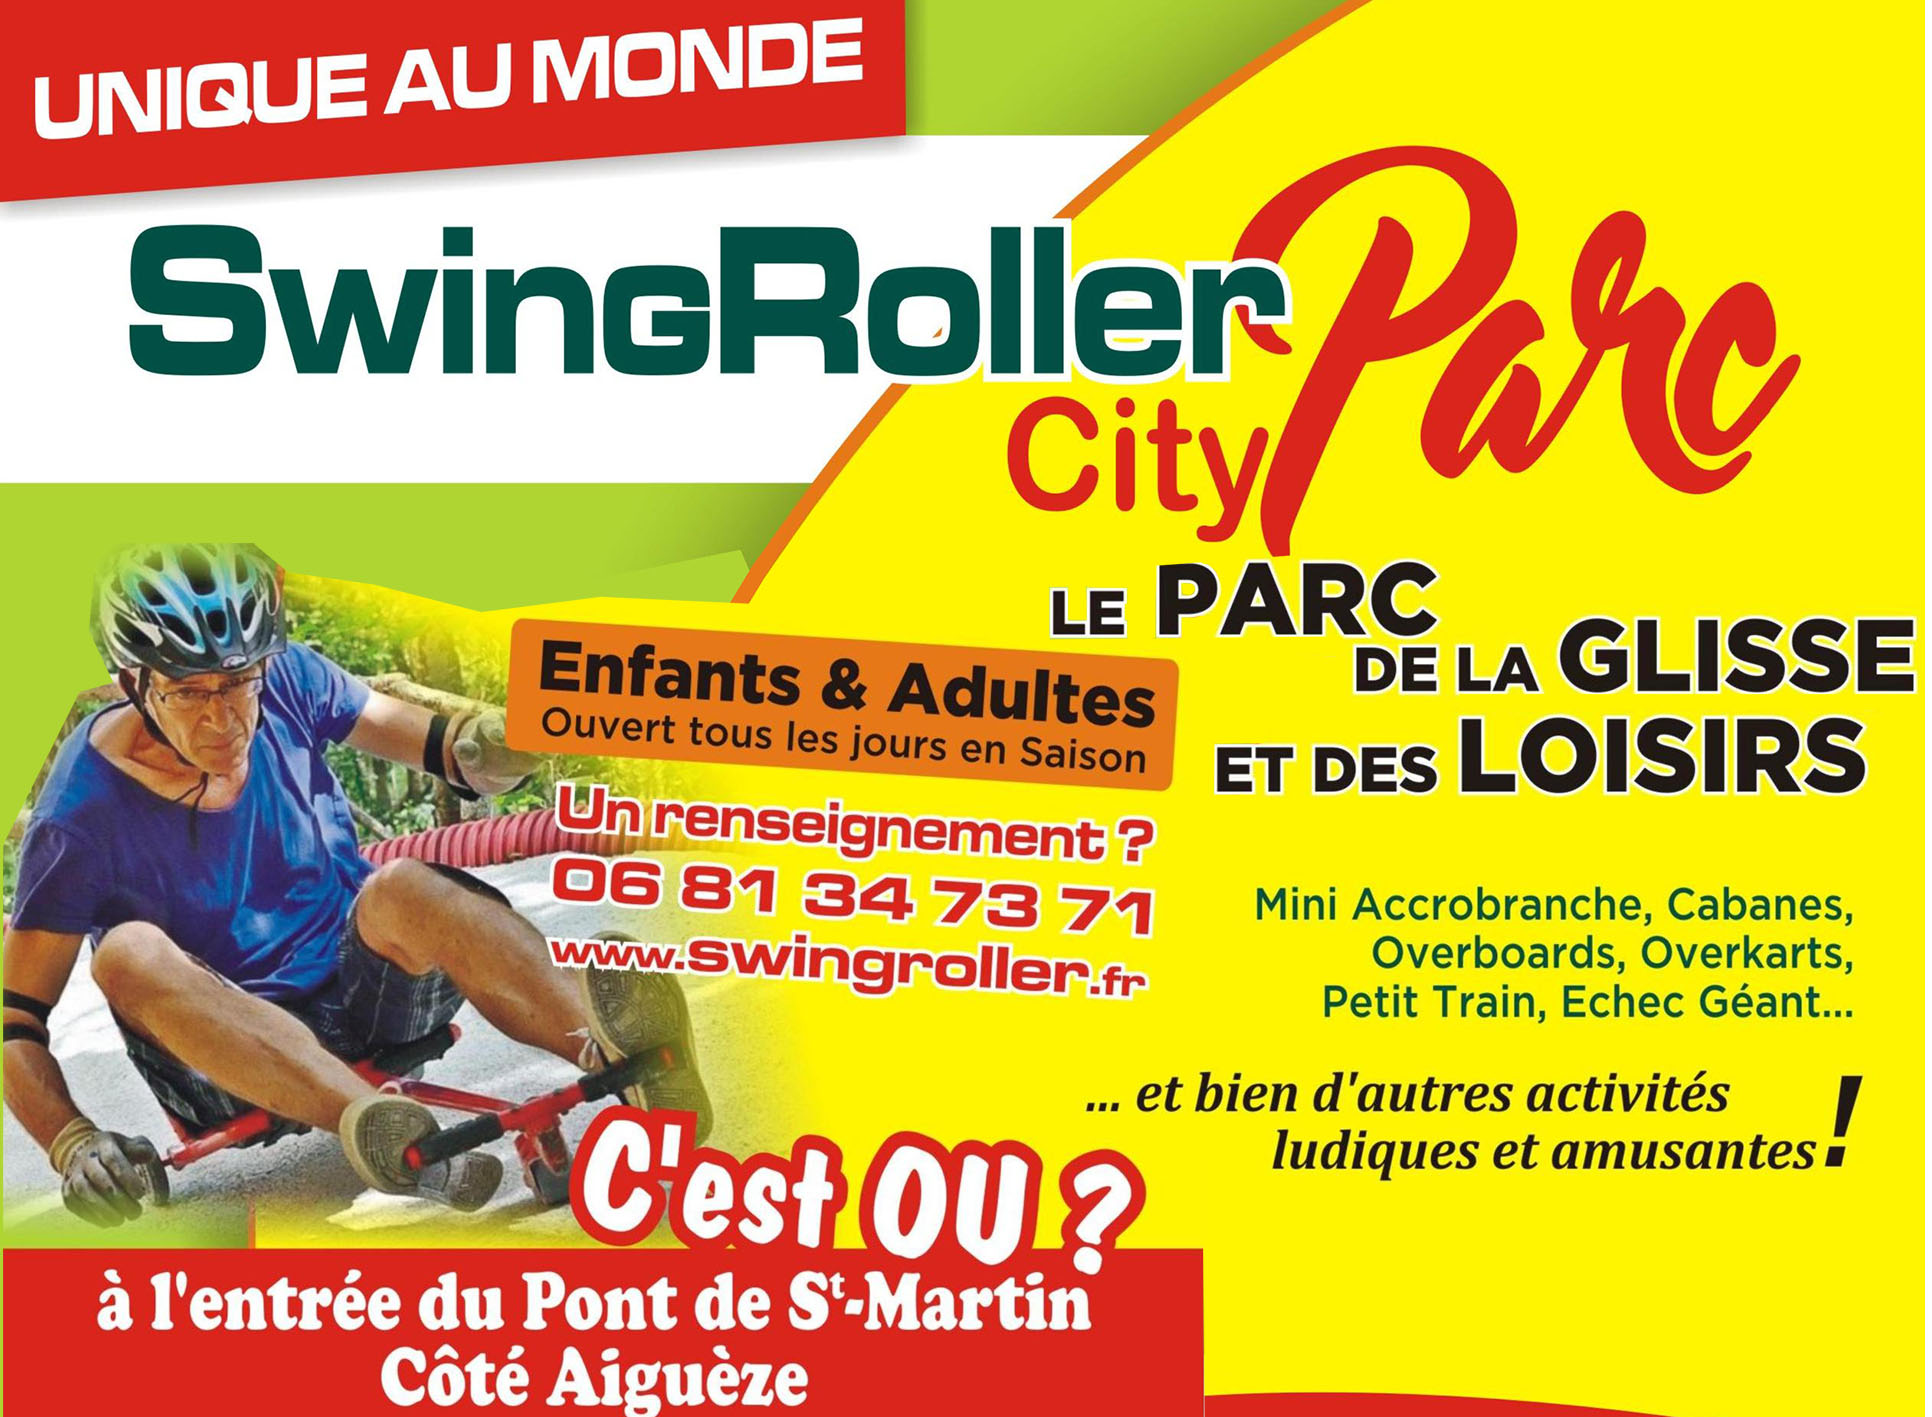 SwingRoller City Parc